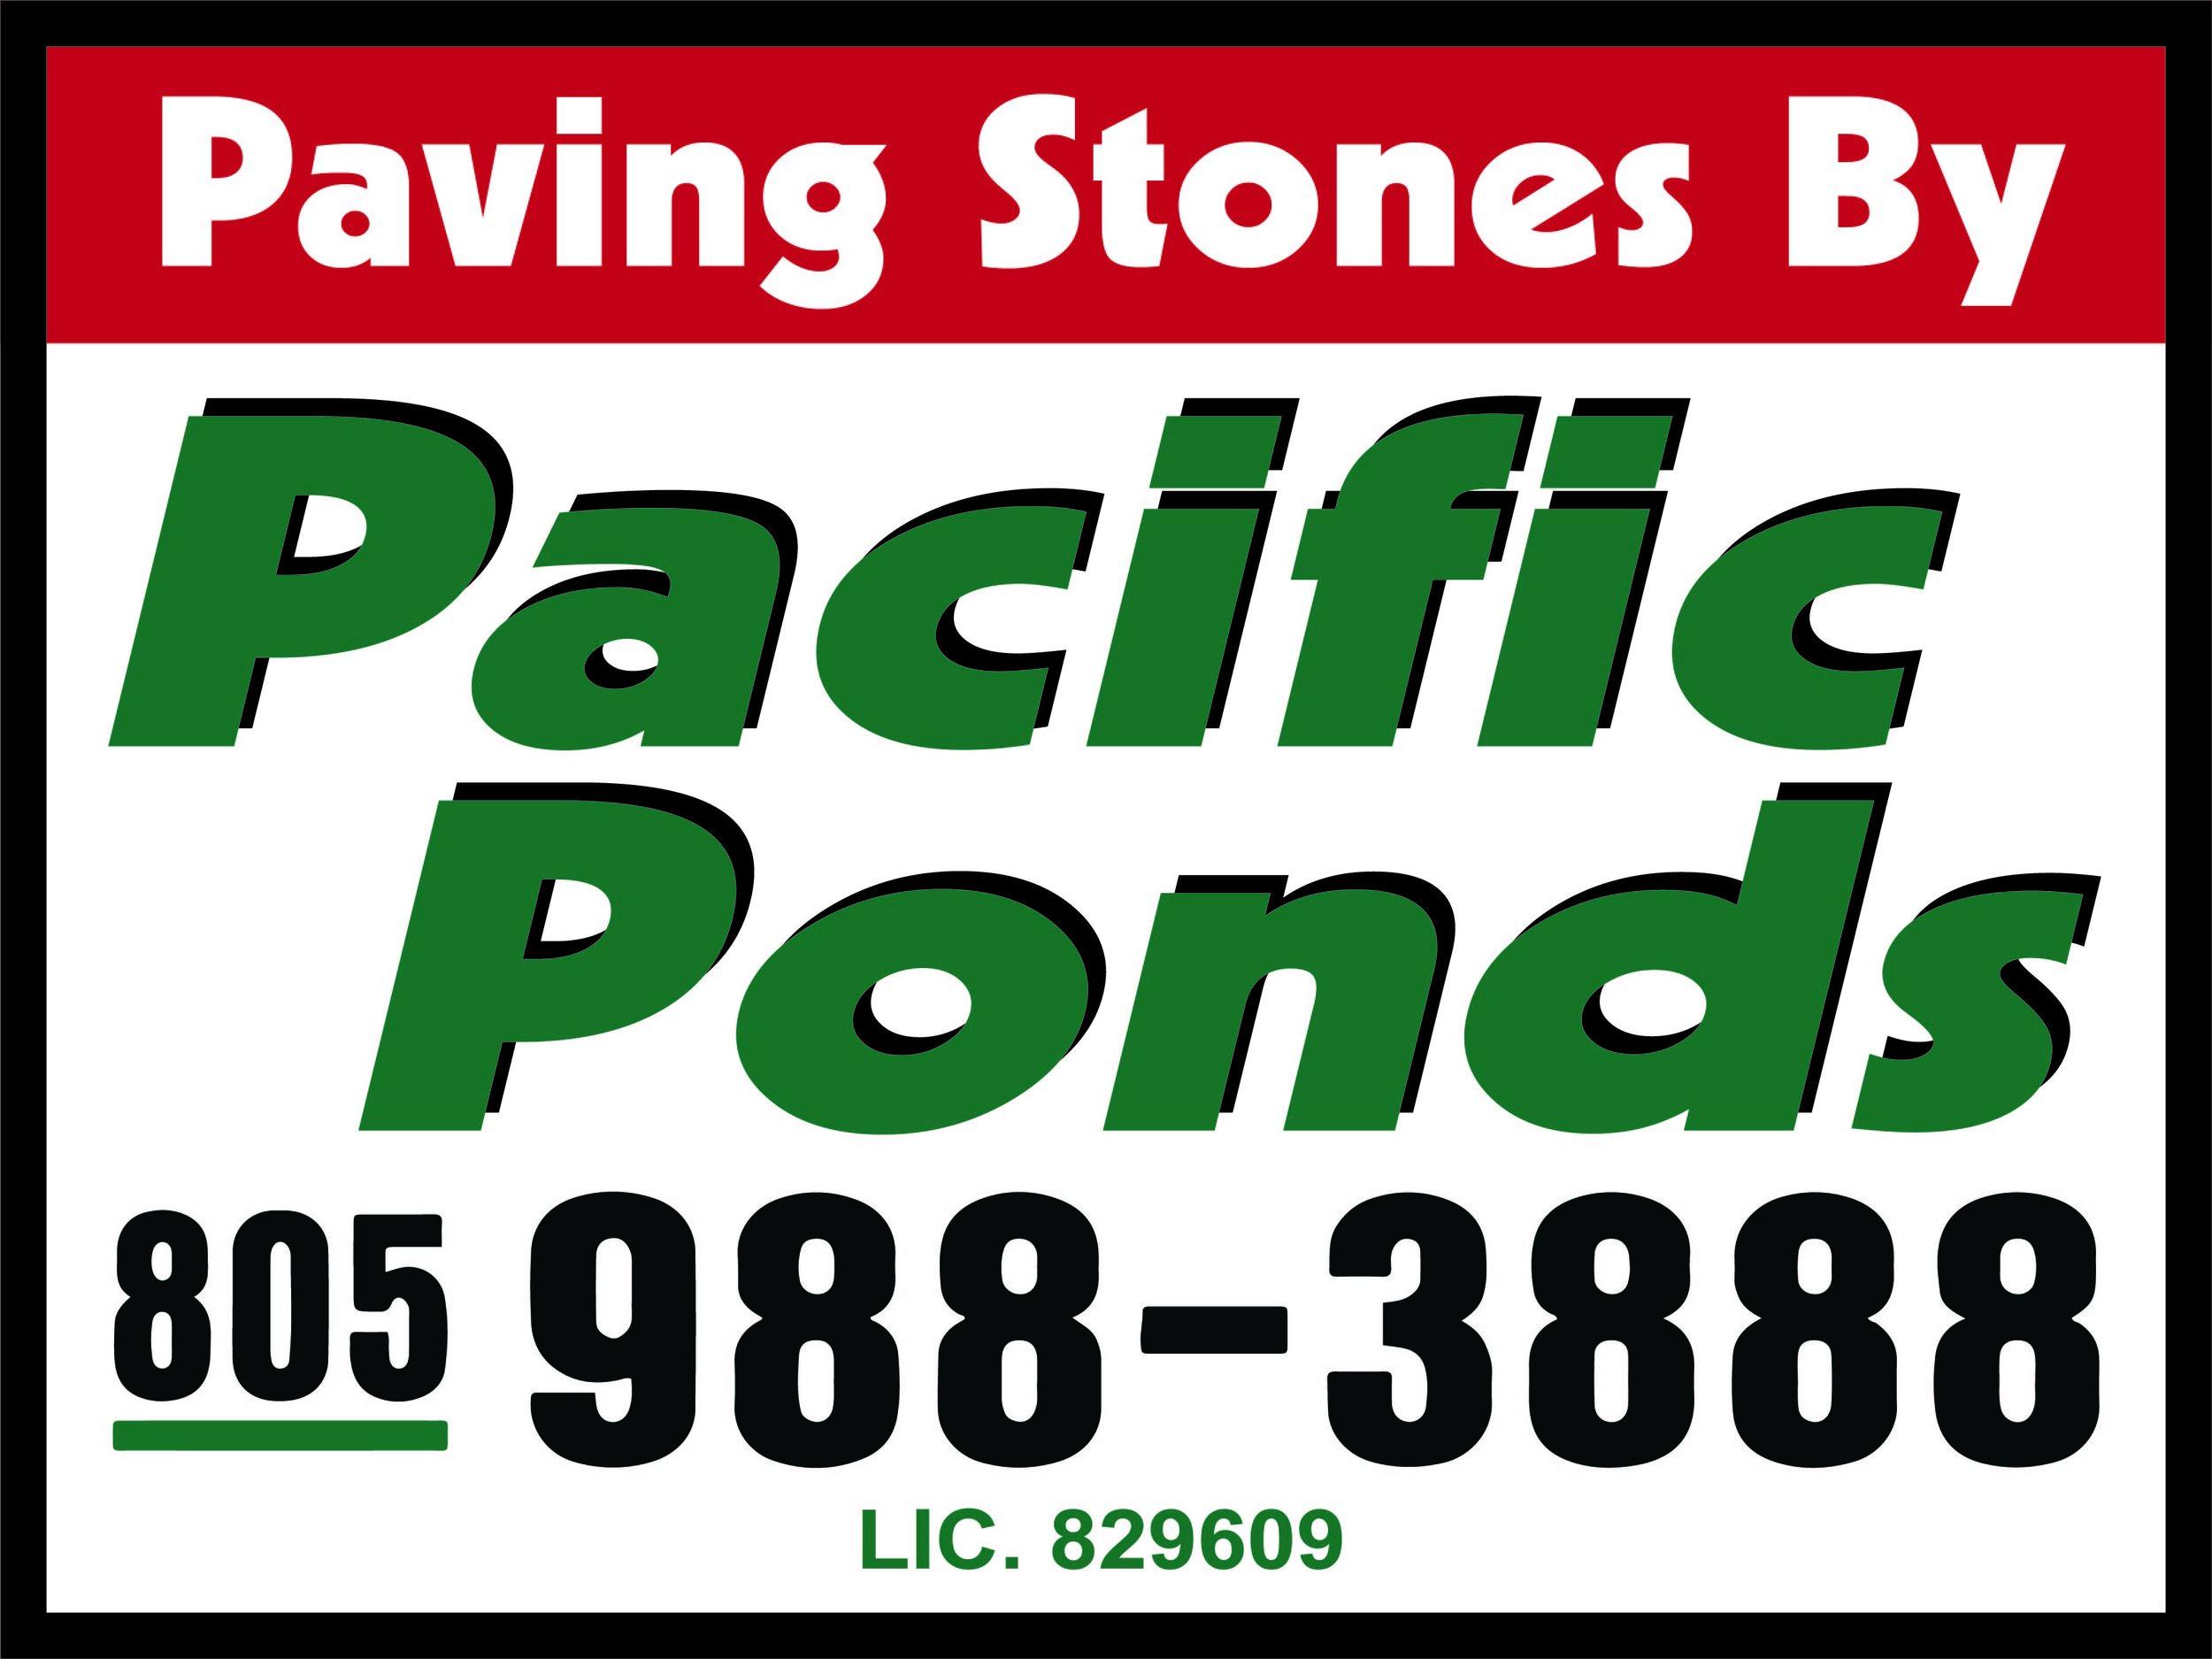 Pacific Ponds paving stones 1-02.jpg